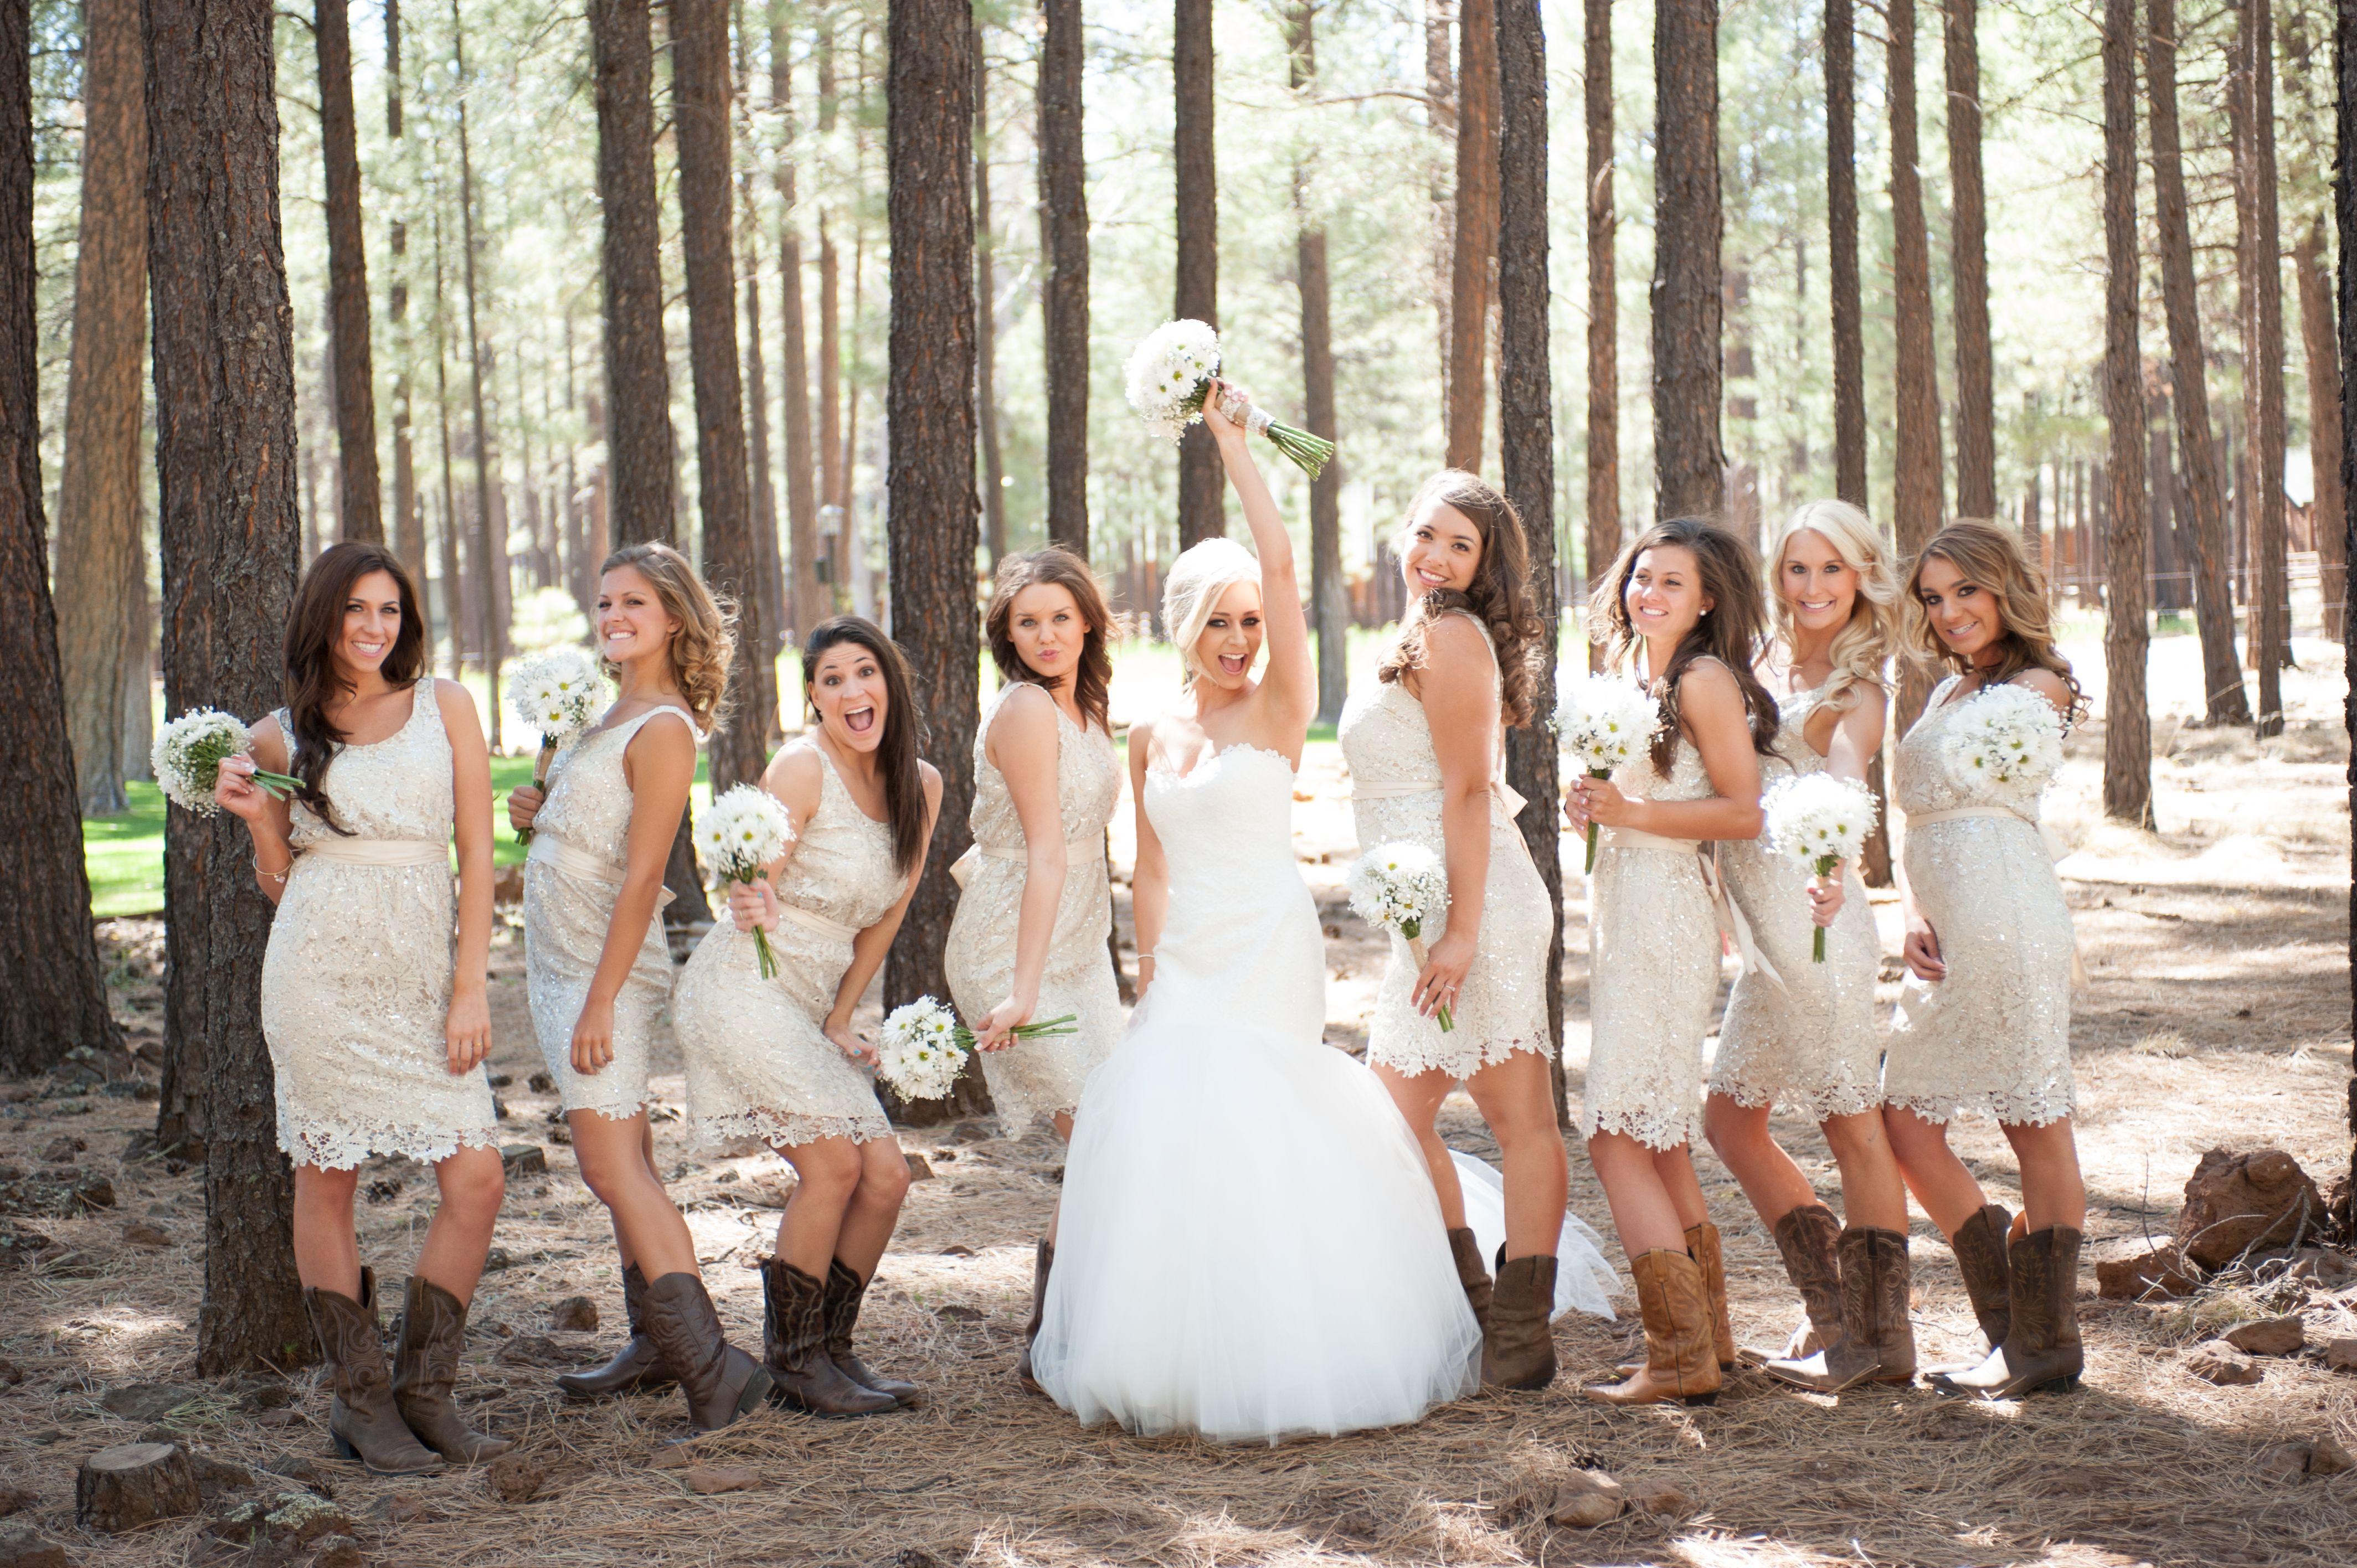 barn wedding dresses Country Wedding Rustic Wedding Barn Wedding Lace Bridesmaids Dress Sparkly Bridesmaids Dress